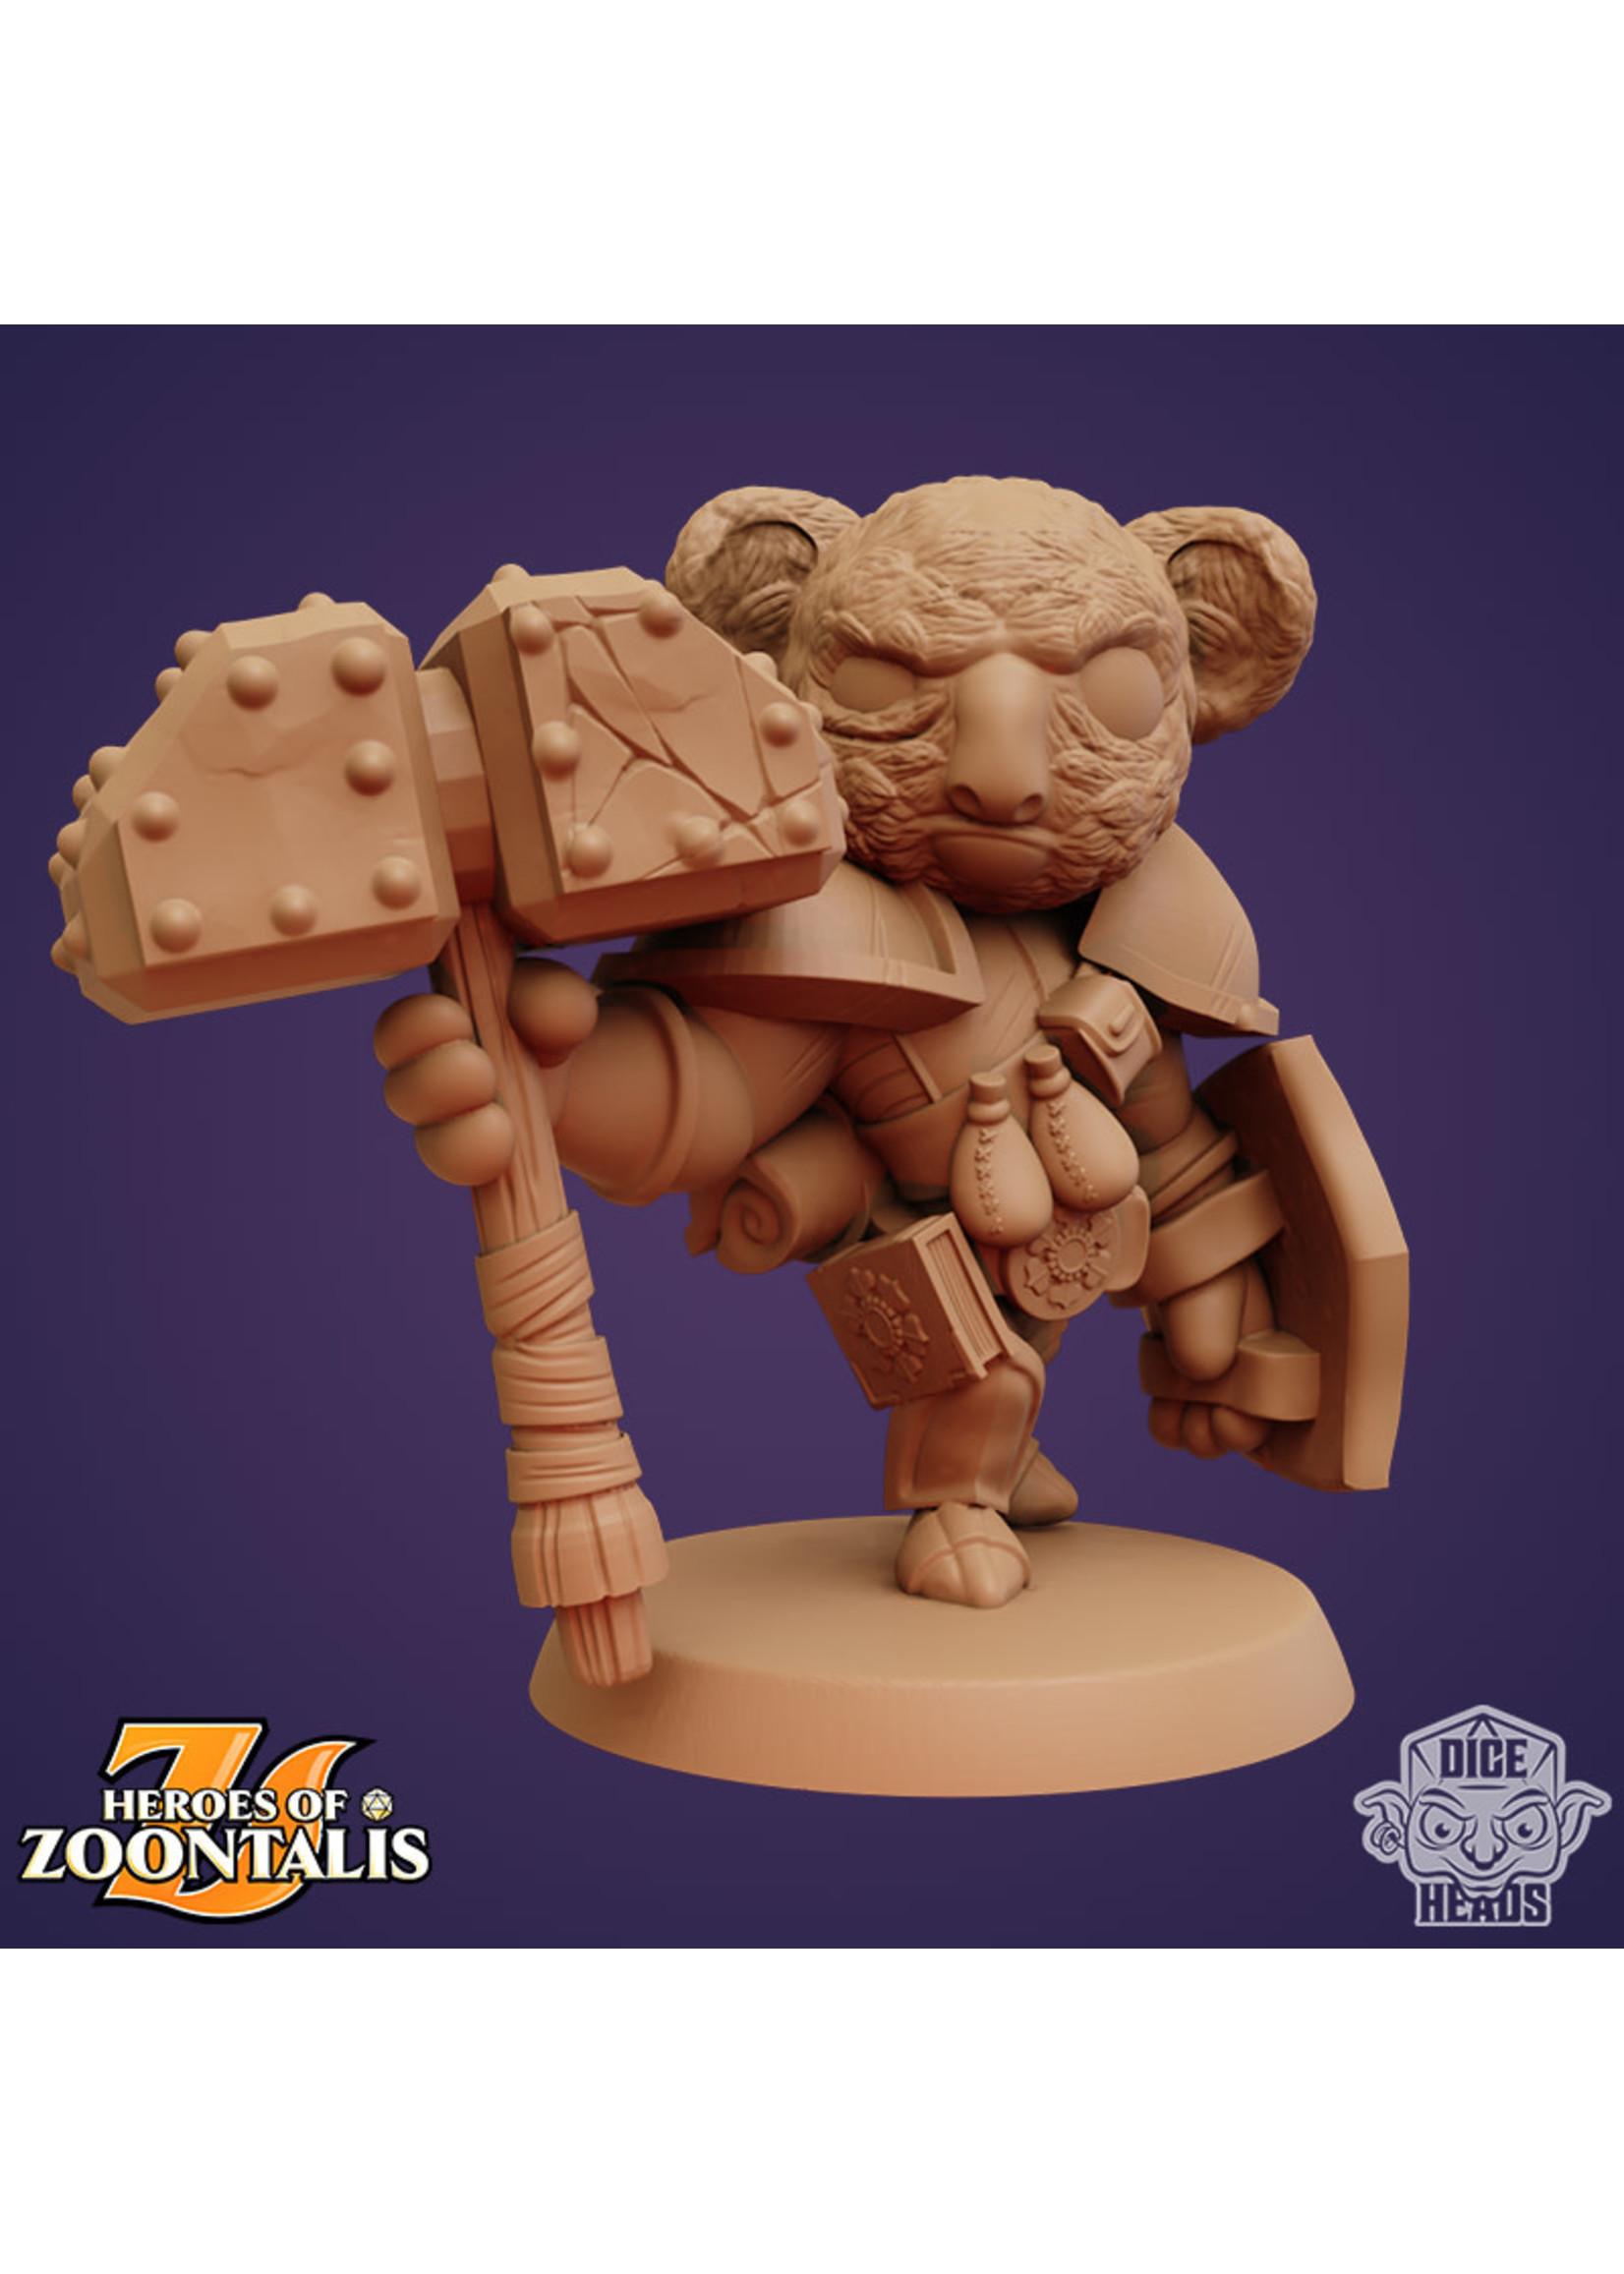 3D Printed Miniature - Koala-Cleric - Dungeons & Dragons - Zoontalis KS